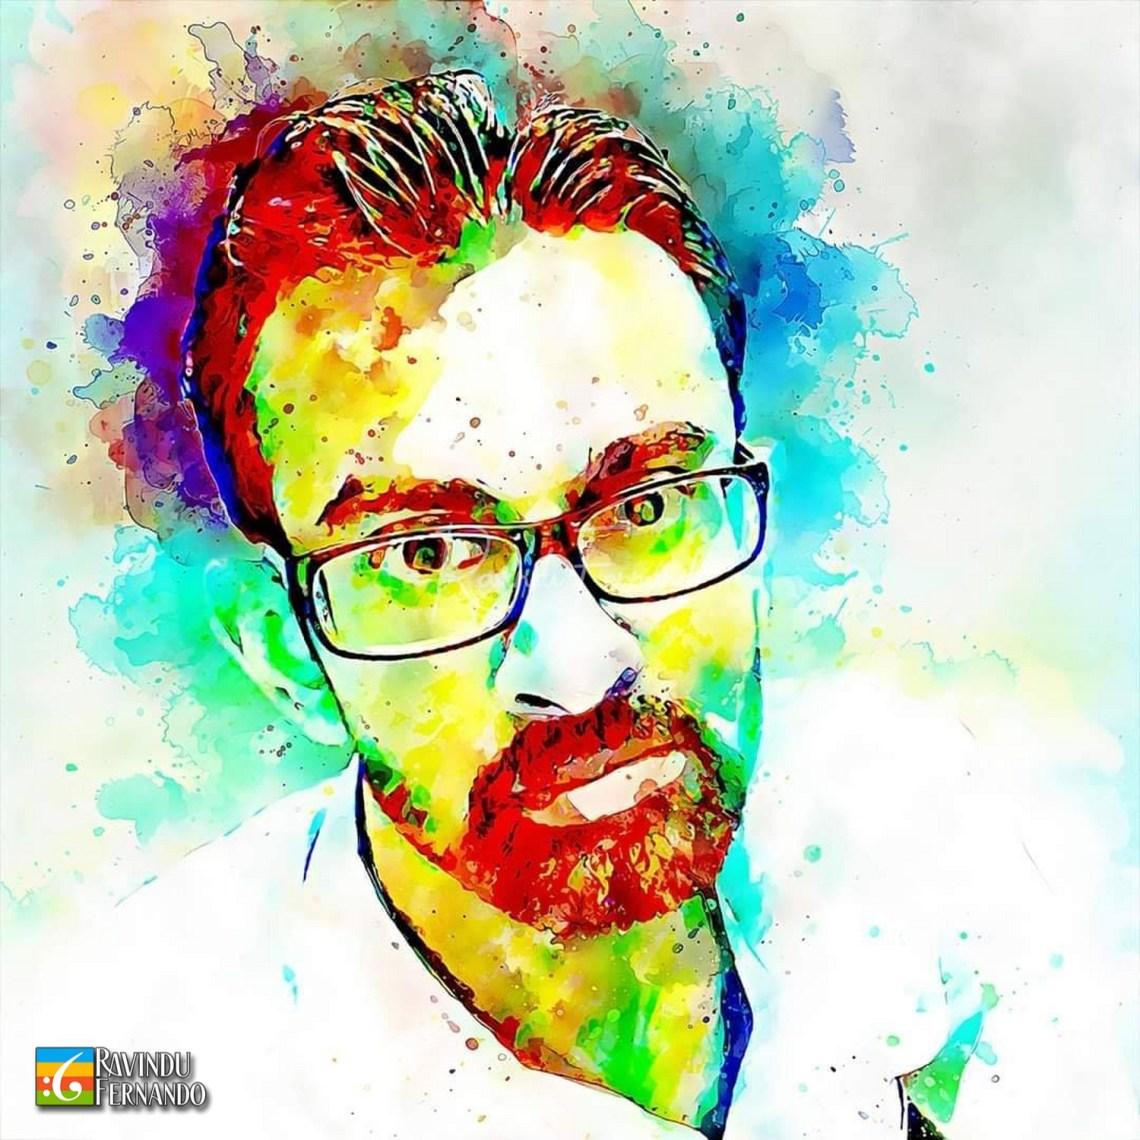 Sandaru Wijayasena - Digital Watercolor Painting